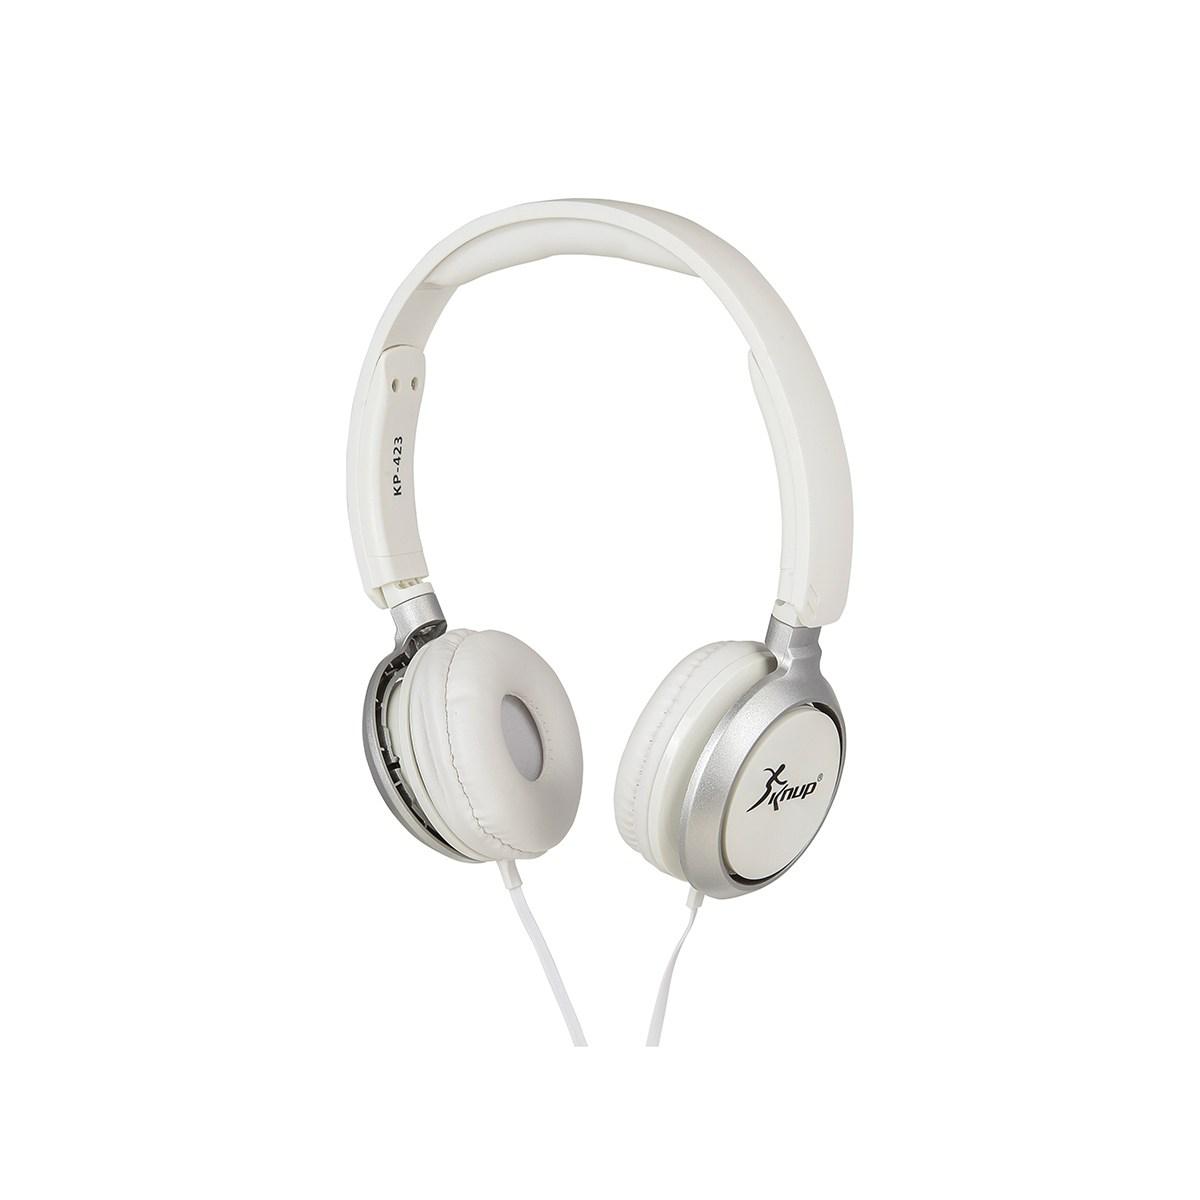 Fone De Ouvido Com Microfone Knup Kp-423 p2 Branco